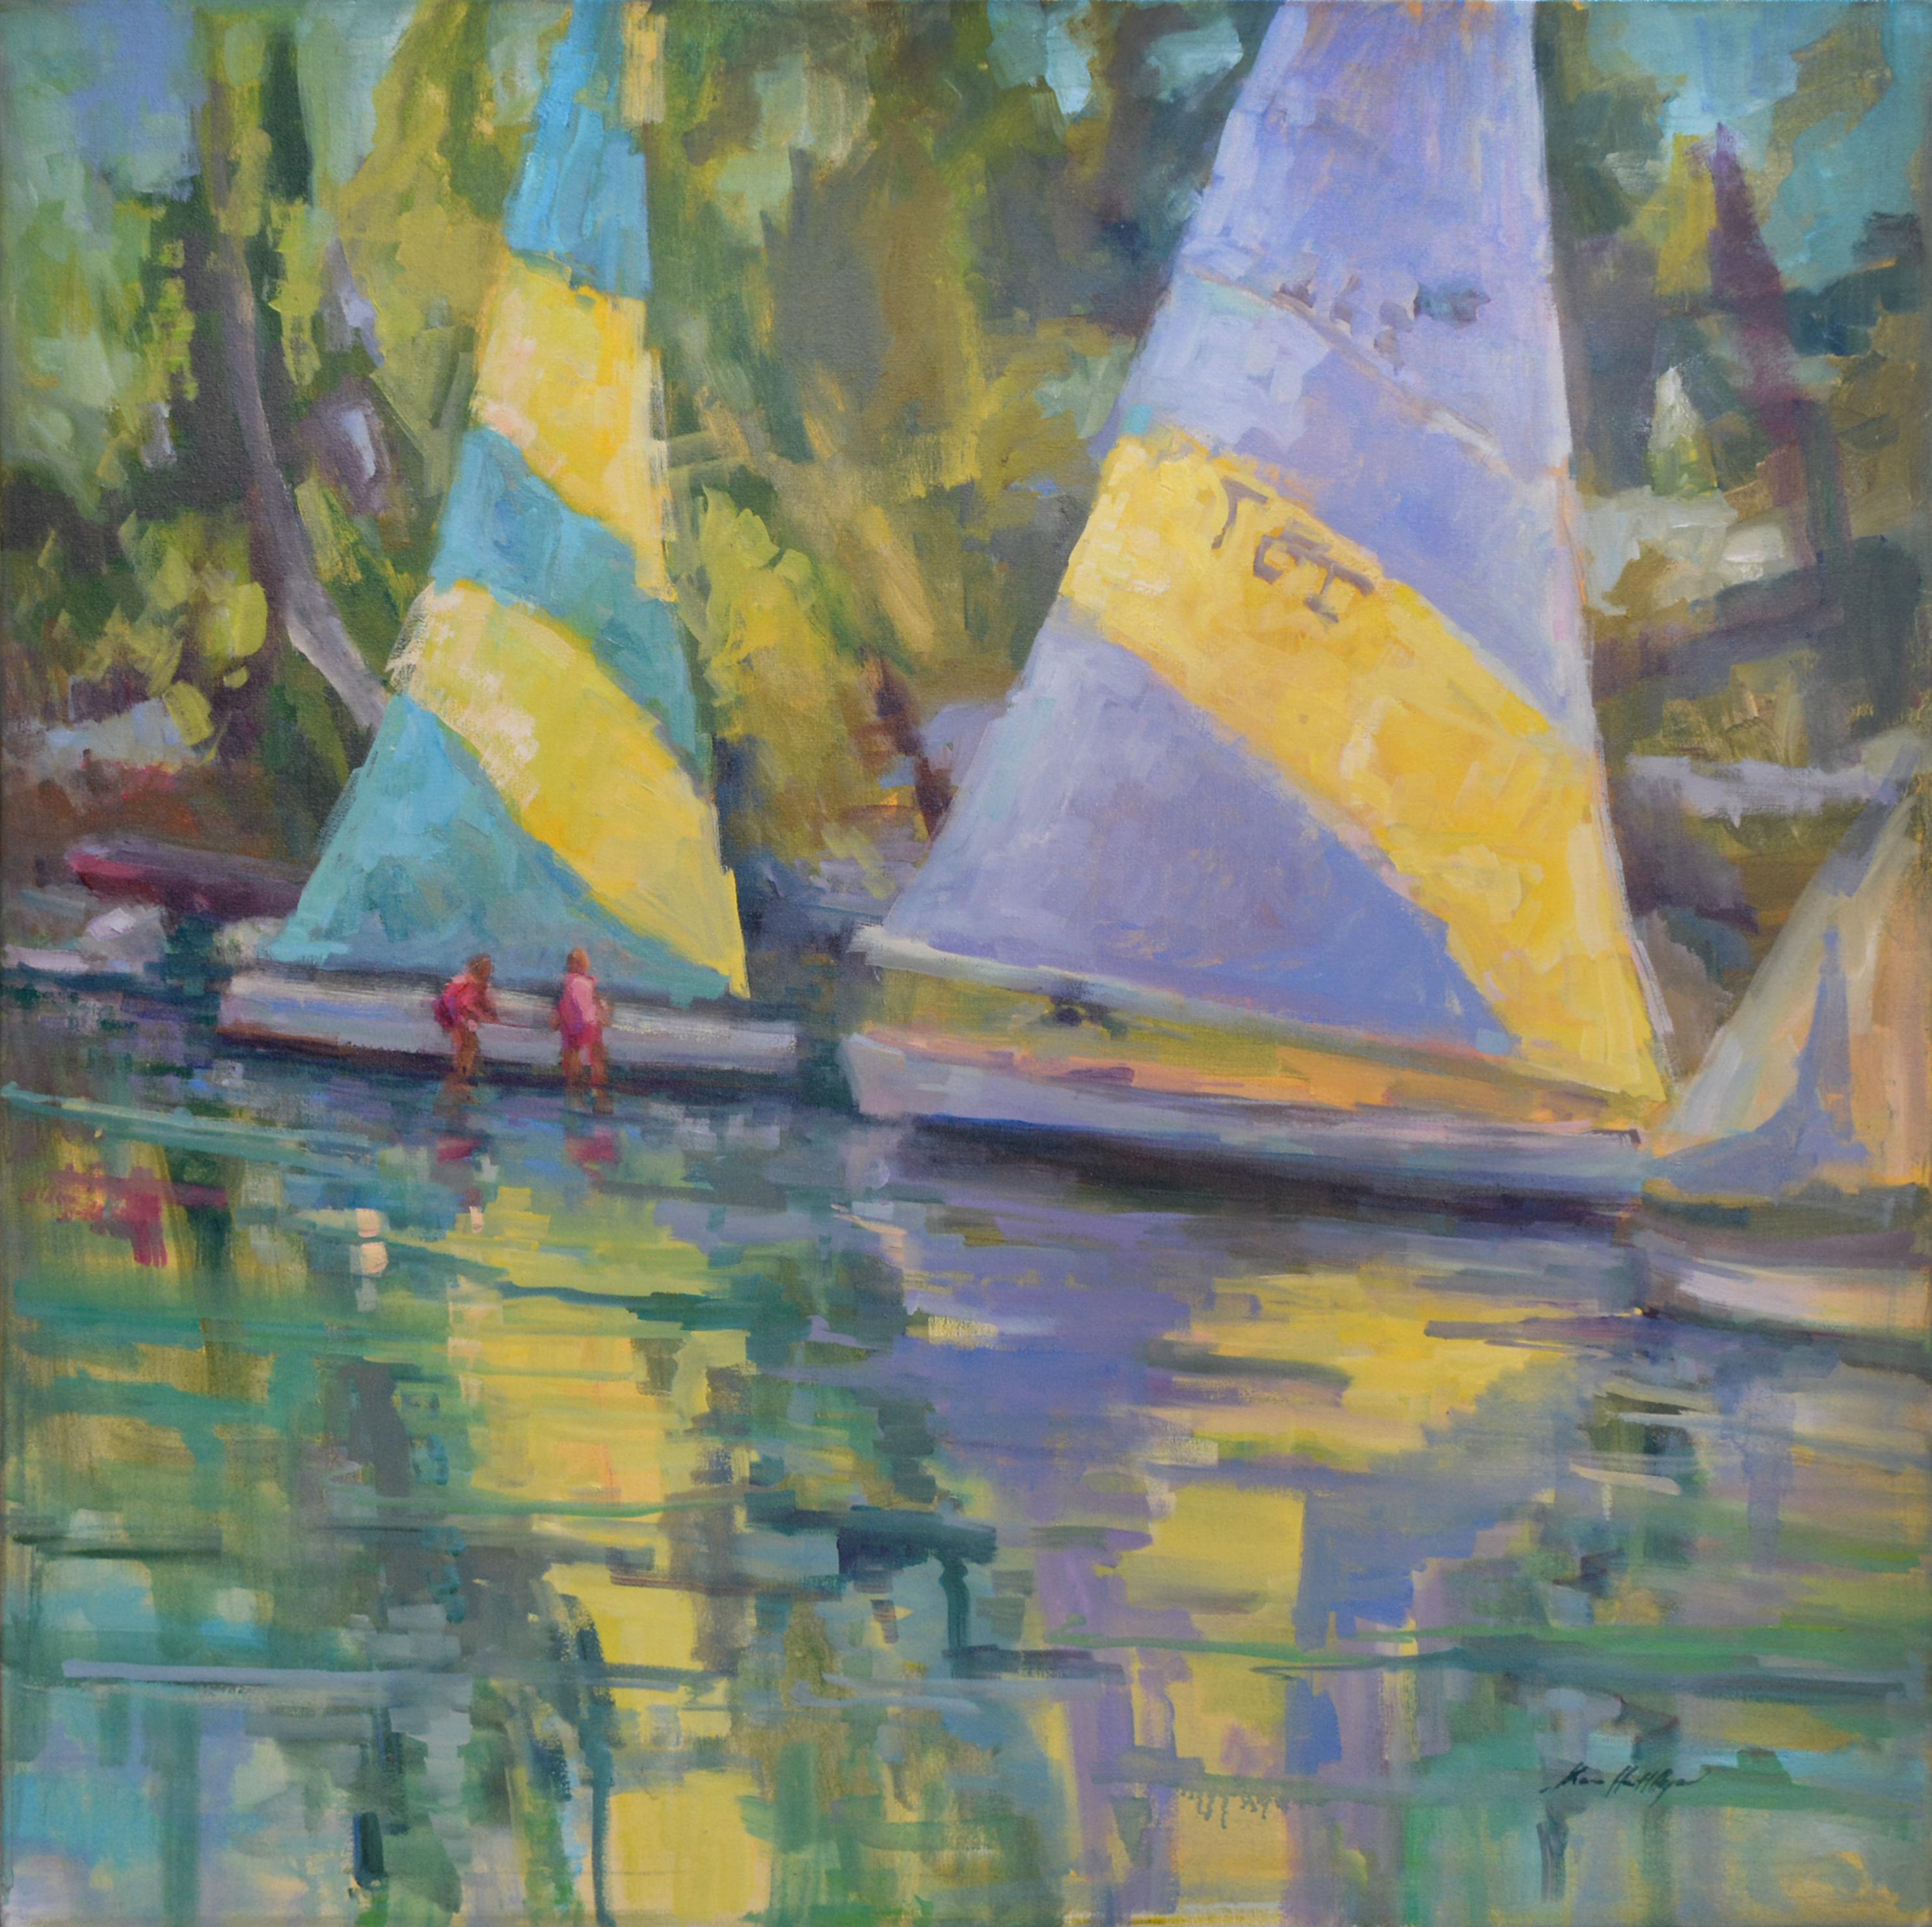 Hope Town Sails by Karen Hewitt Hagan